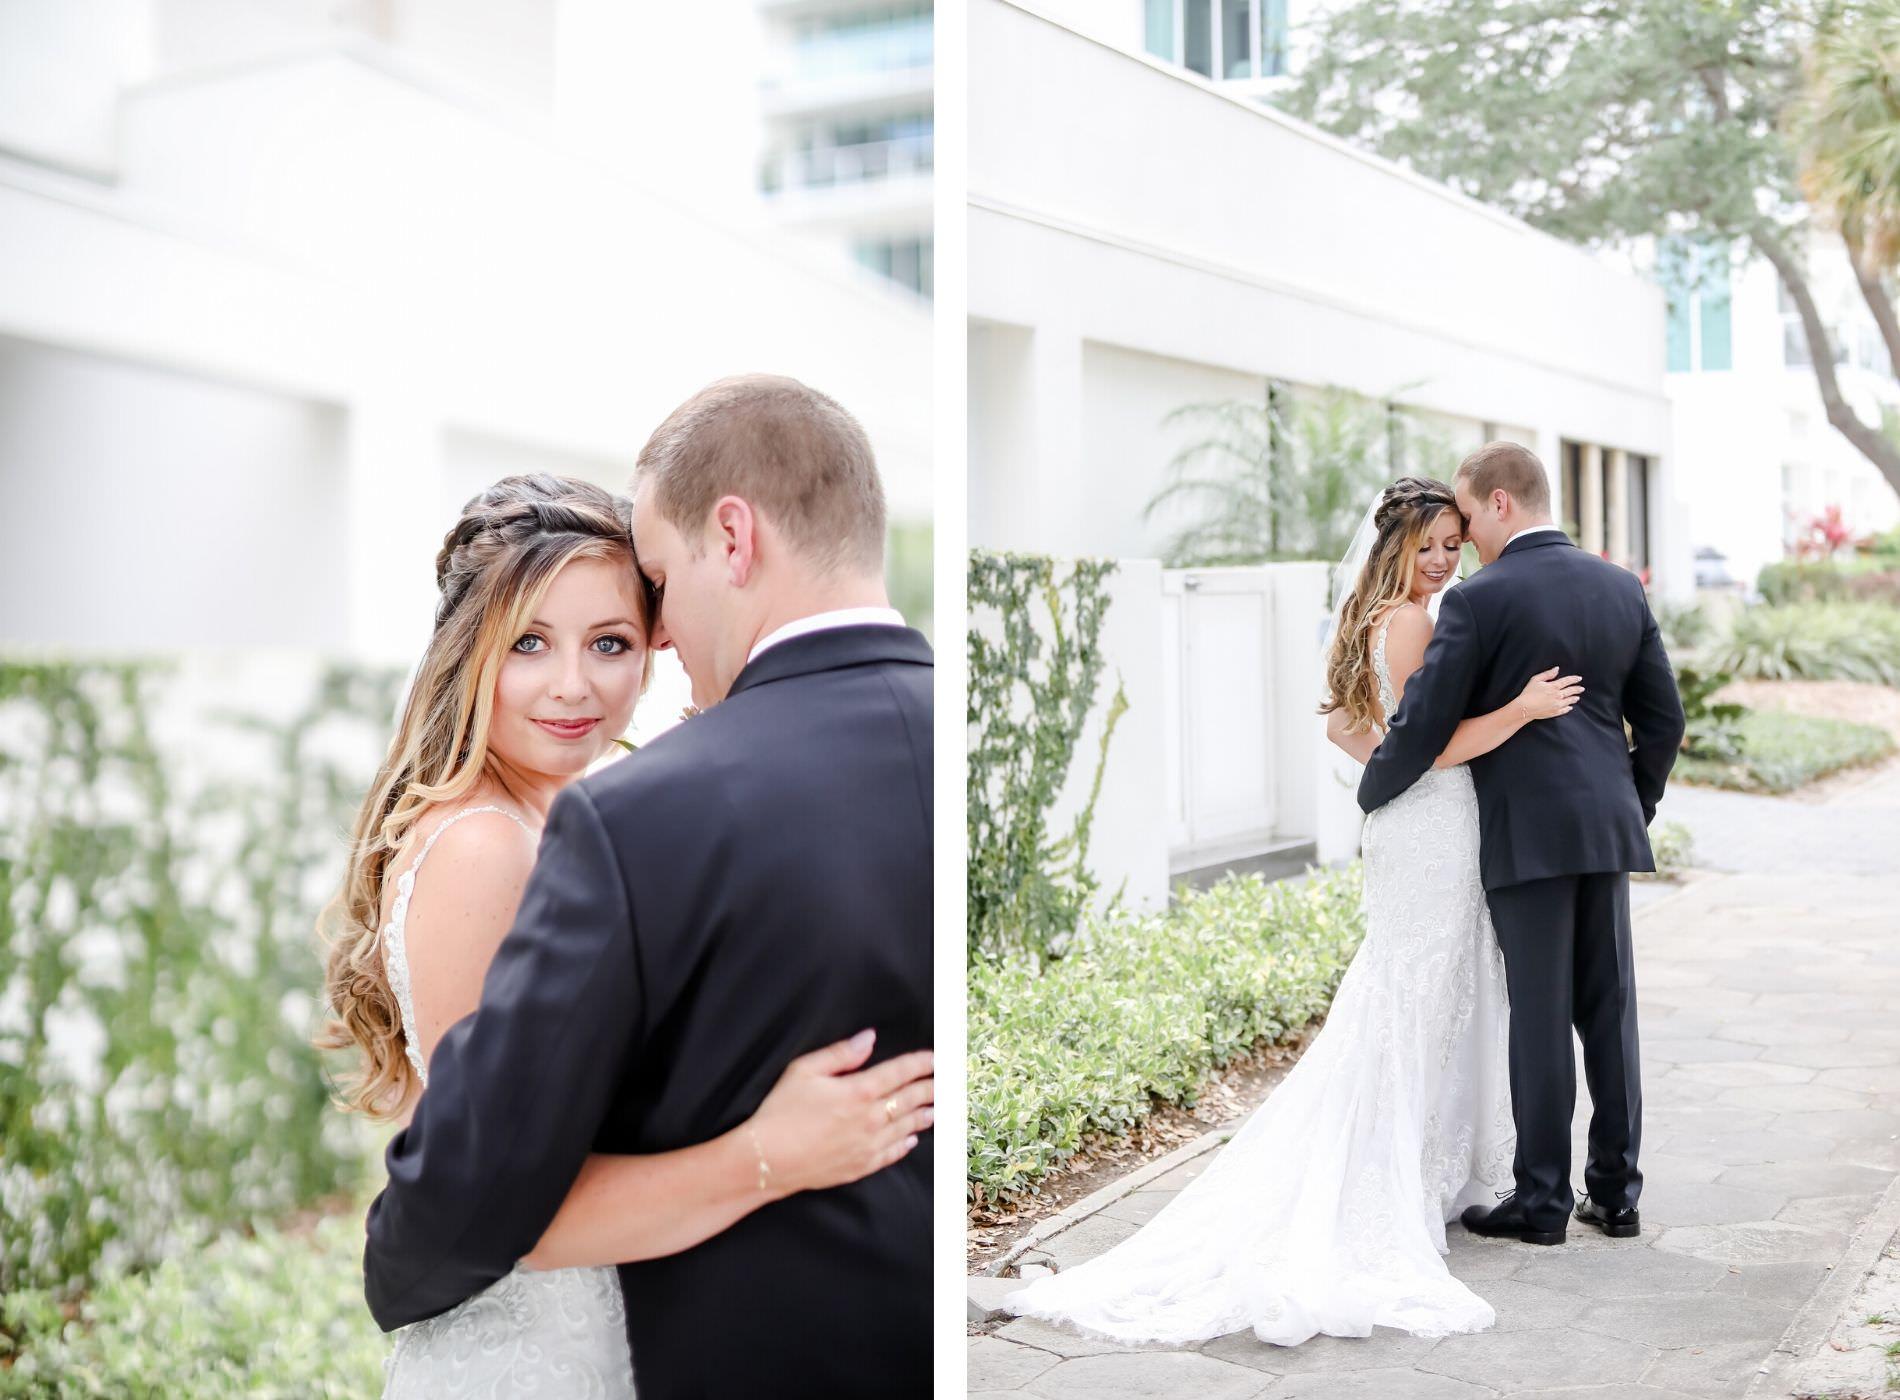 Downtown St. Pete Bride and Groom First Look Wedding Portrait   Florida Wedding Photographer Lifelong Photography Studio   Tampa Bay Wedding Venue The Birchwood